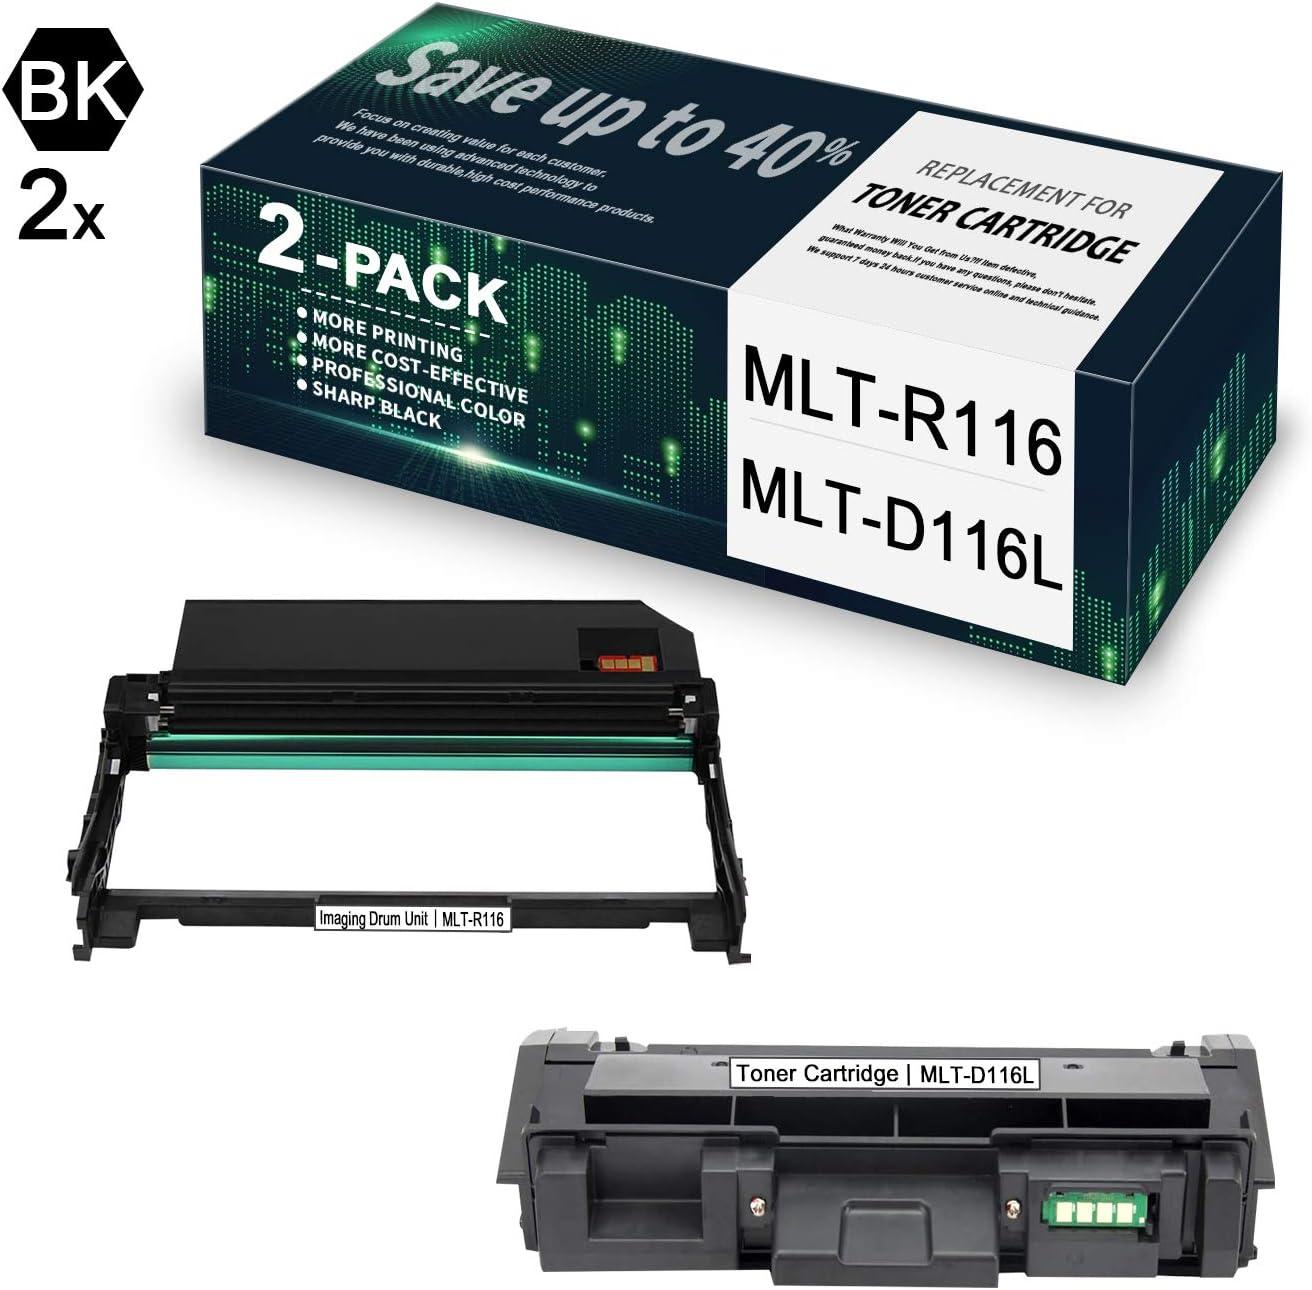 1-Pack MLT-R116 今だけ限定15%OFFクーポン発行中 お金を節約 Drum + Toner MLT-D116L Compatible